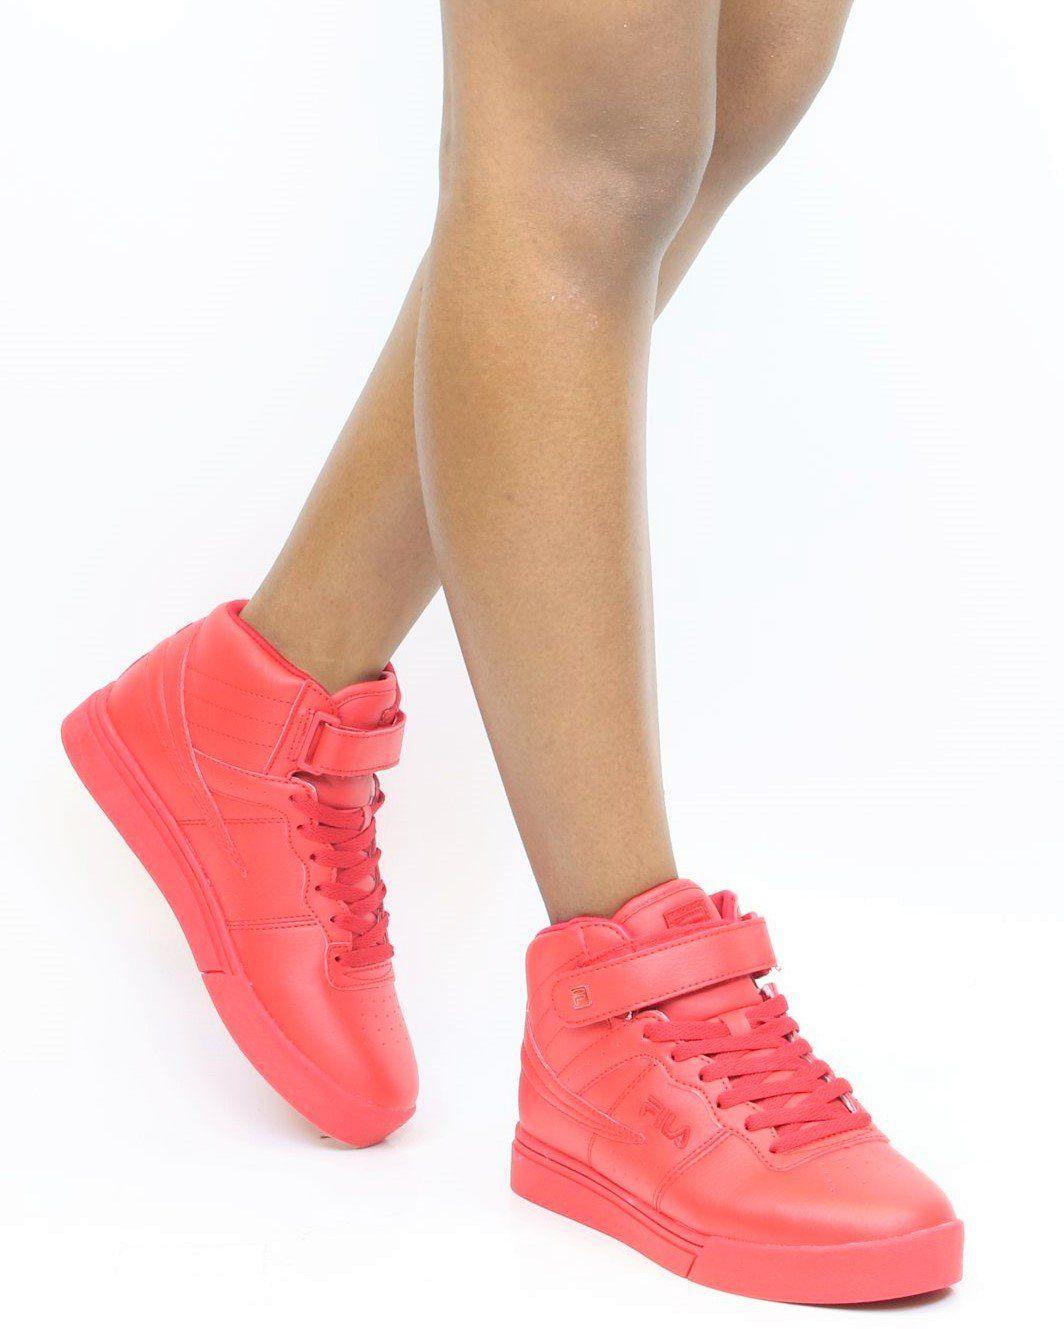 adffd9fb37582 Vulc 13 Mp Tonal Sneaker | Products | Sneakers, Shoes, Fashion